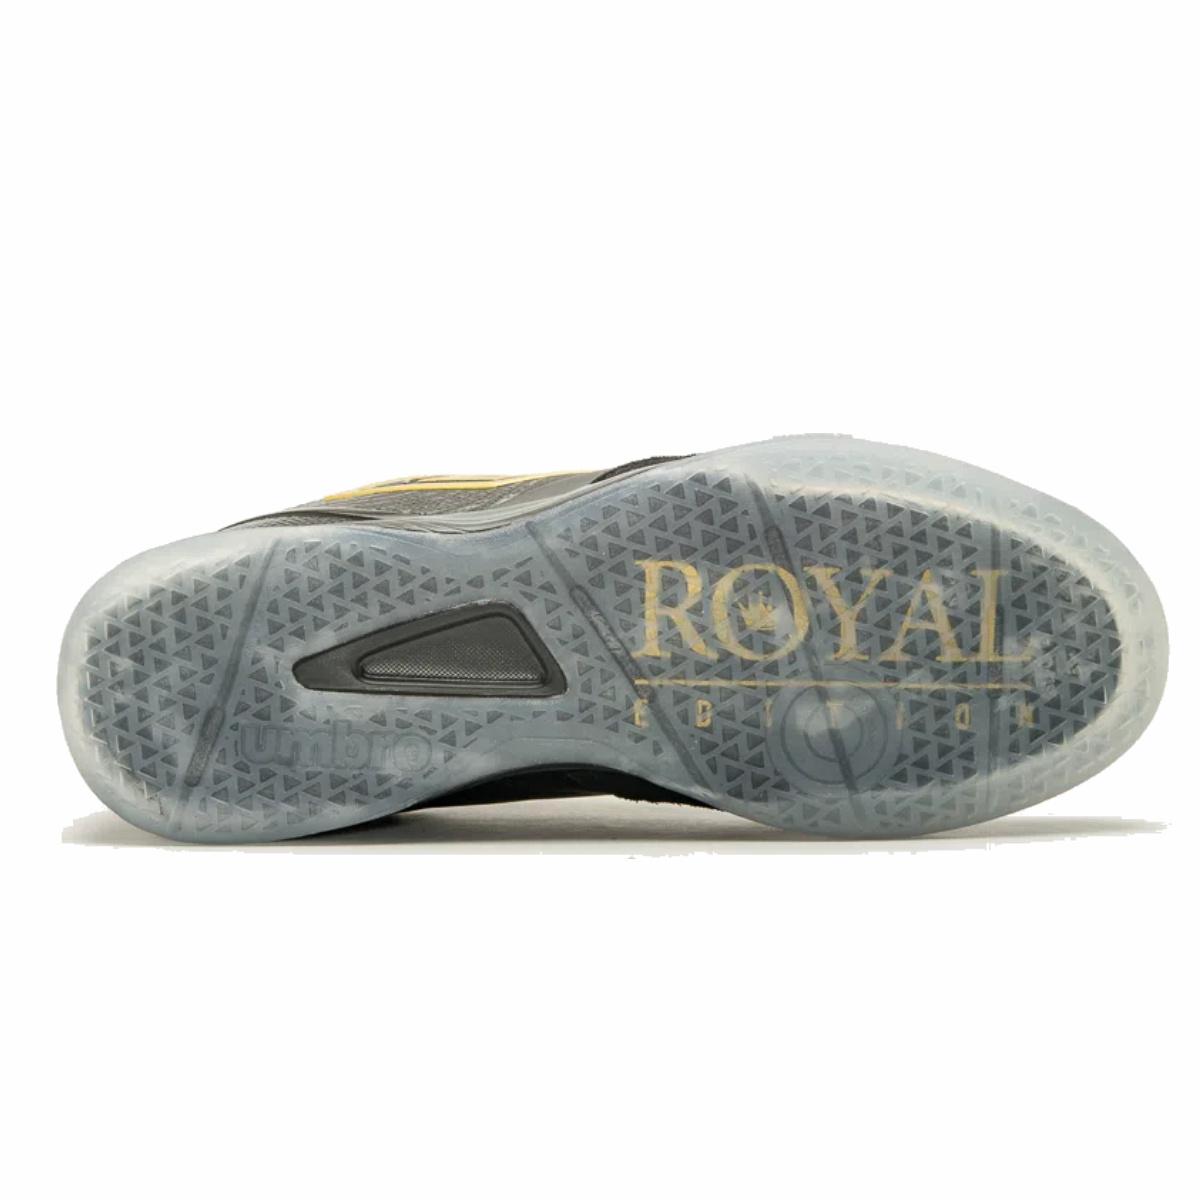 Tenis Umbro Pro 5 Royal Edition Chuteira Futsal Profissional